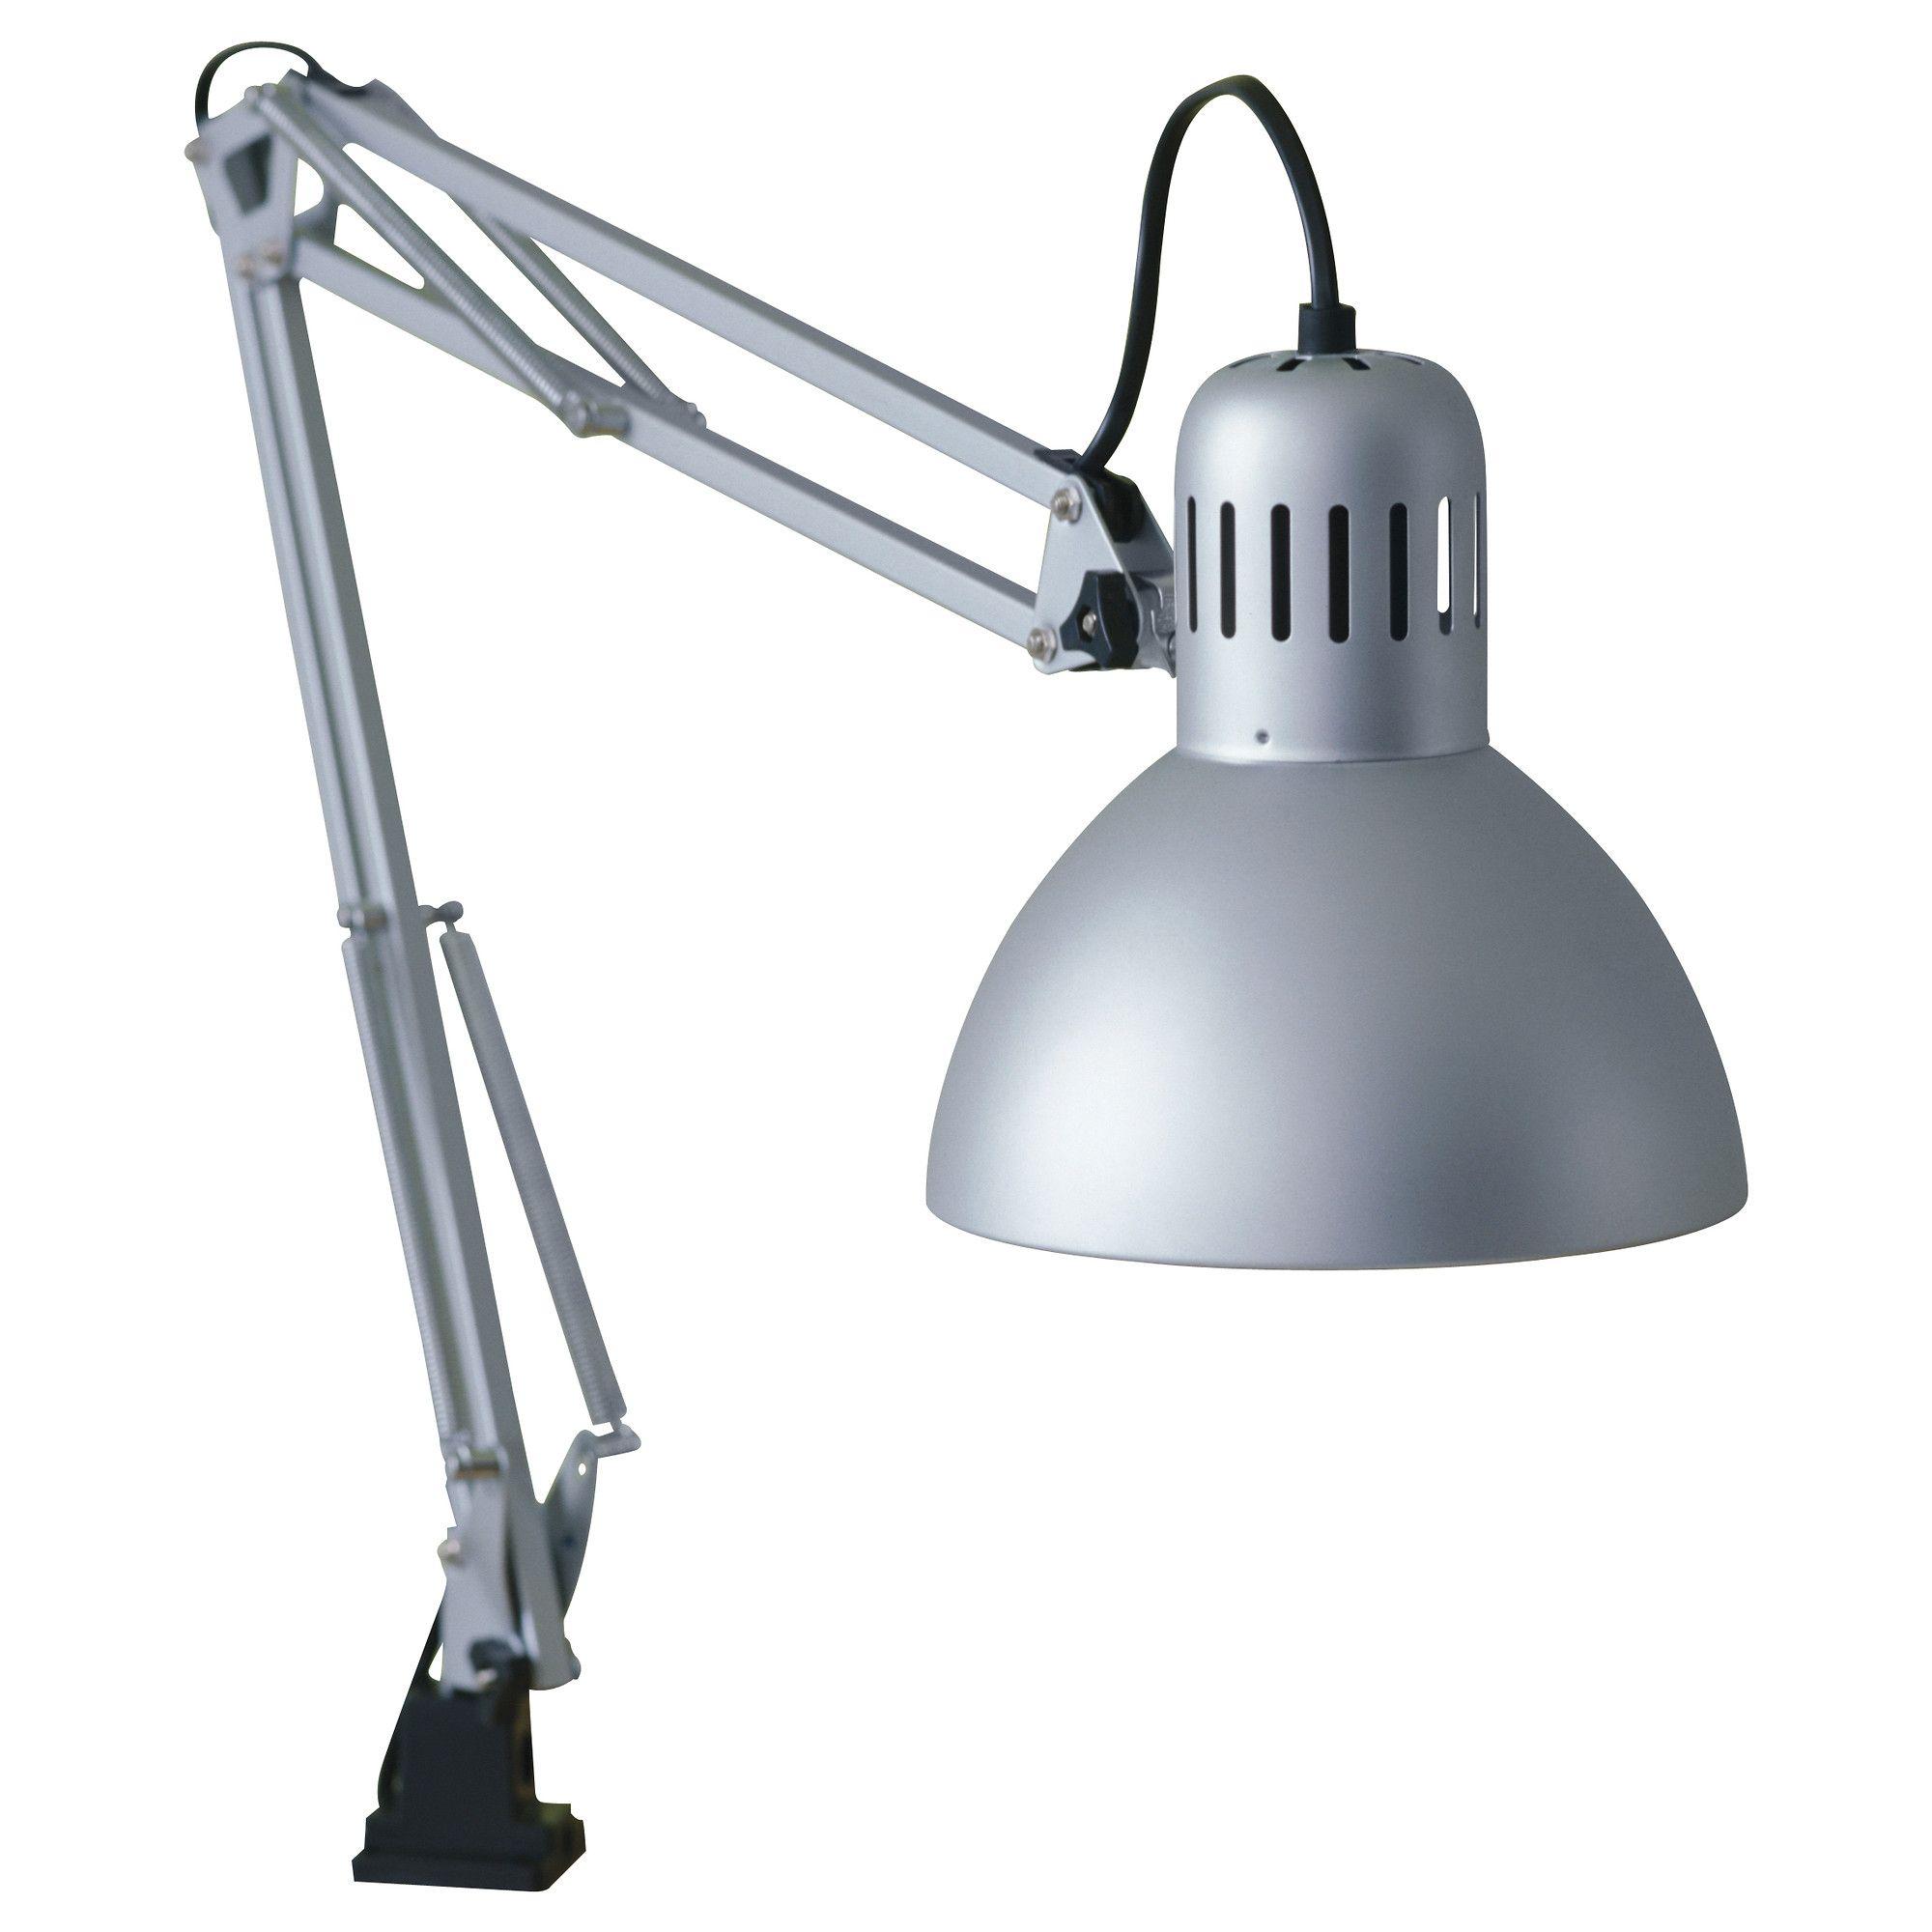 Desk Work Lamp: TERTIAL Work lamp - IKEA $15 Study lamp on drop-leaf desk,Lighting